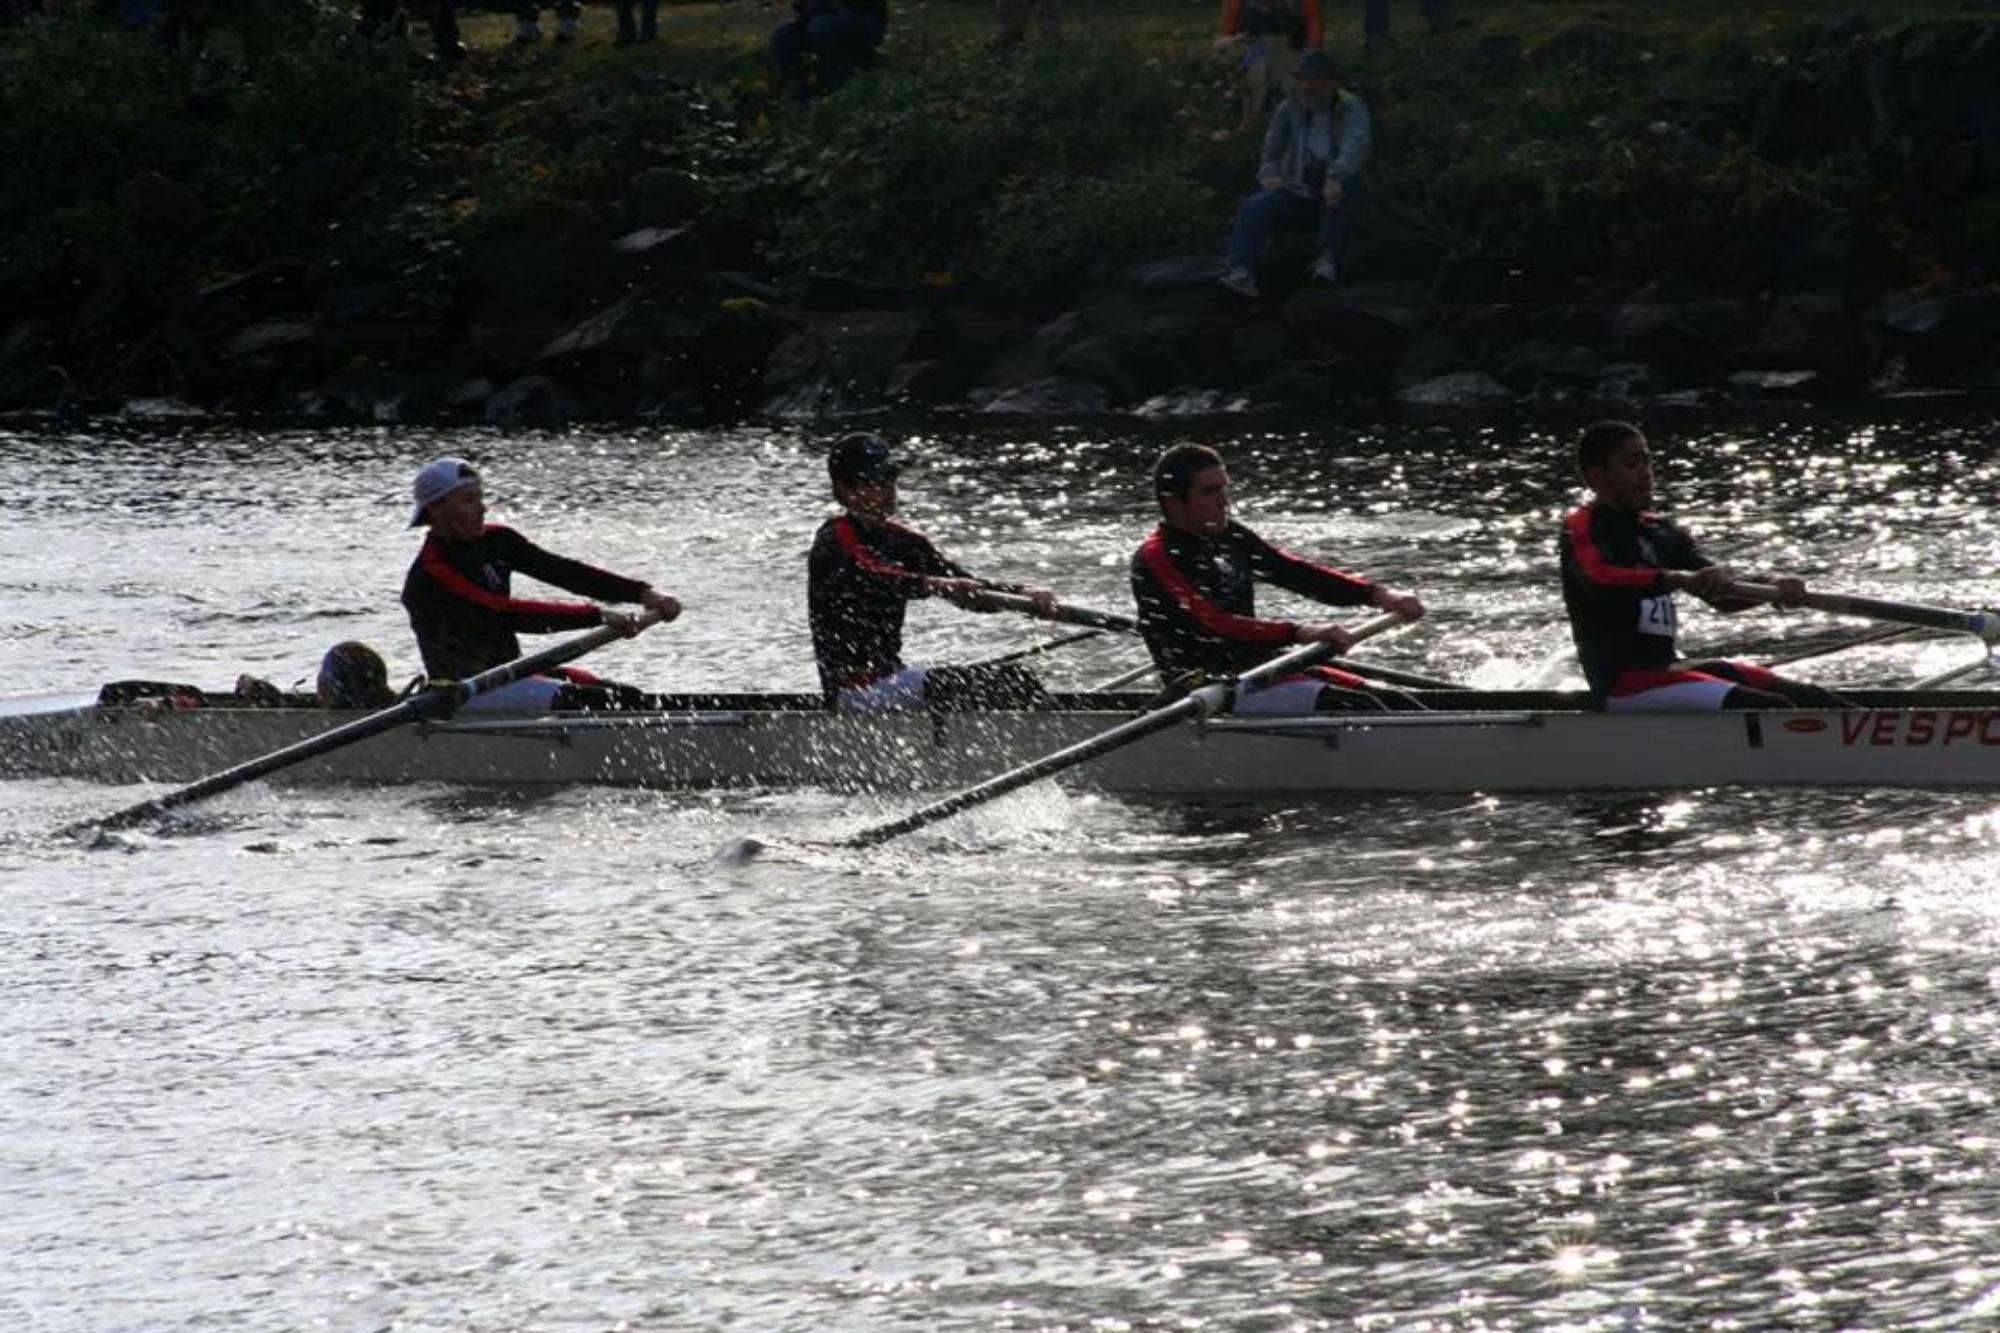 Men's Club Rowing Gears up For Season